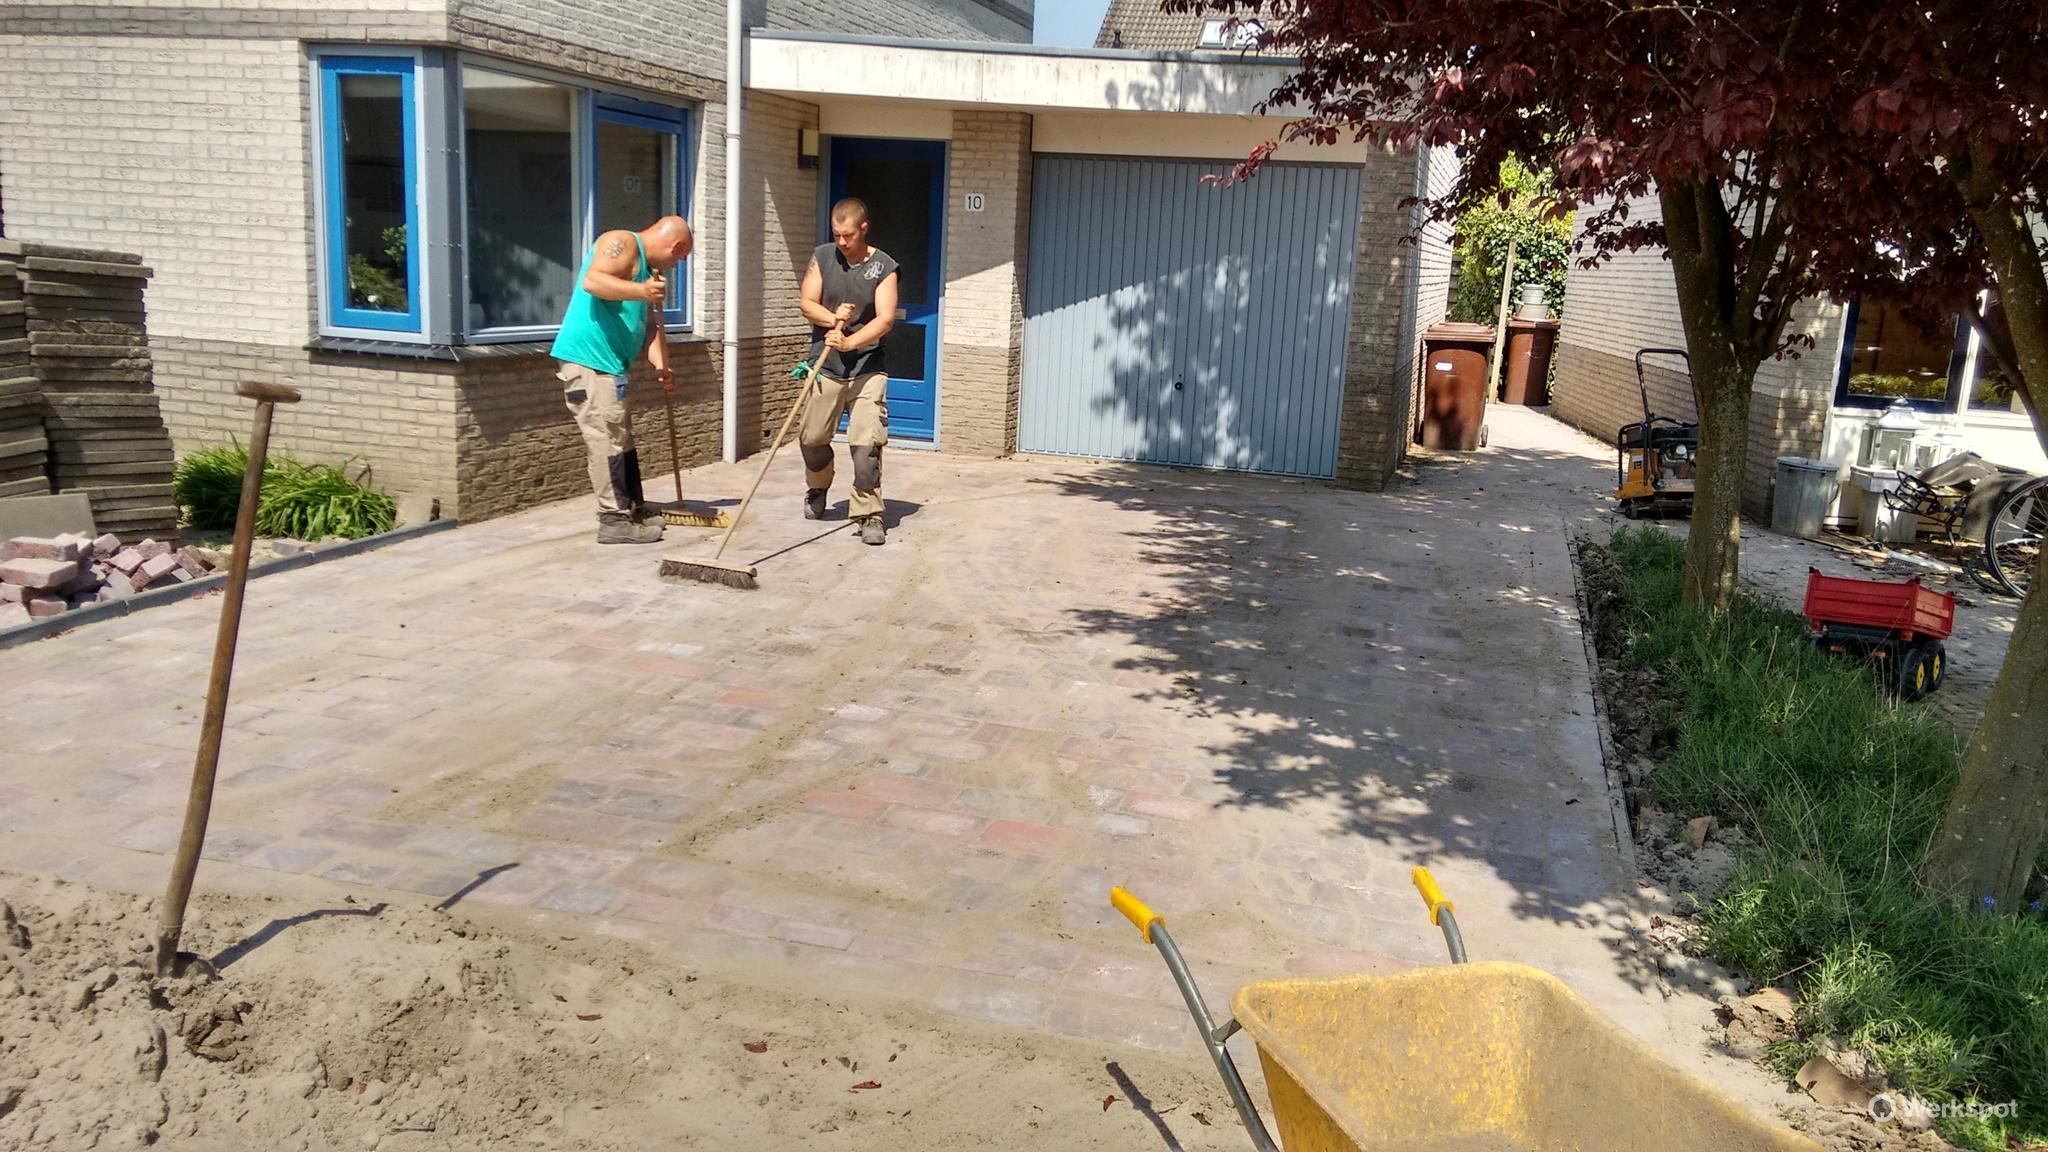 Tegels Gratis Leggen : Tegels in de tuin leggen ca. 85 m^2 werkspot